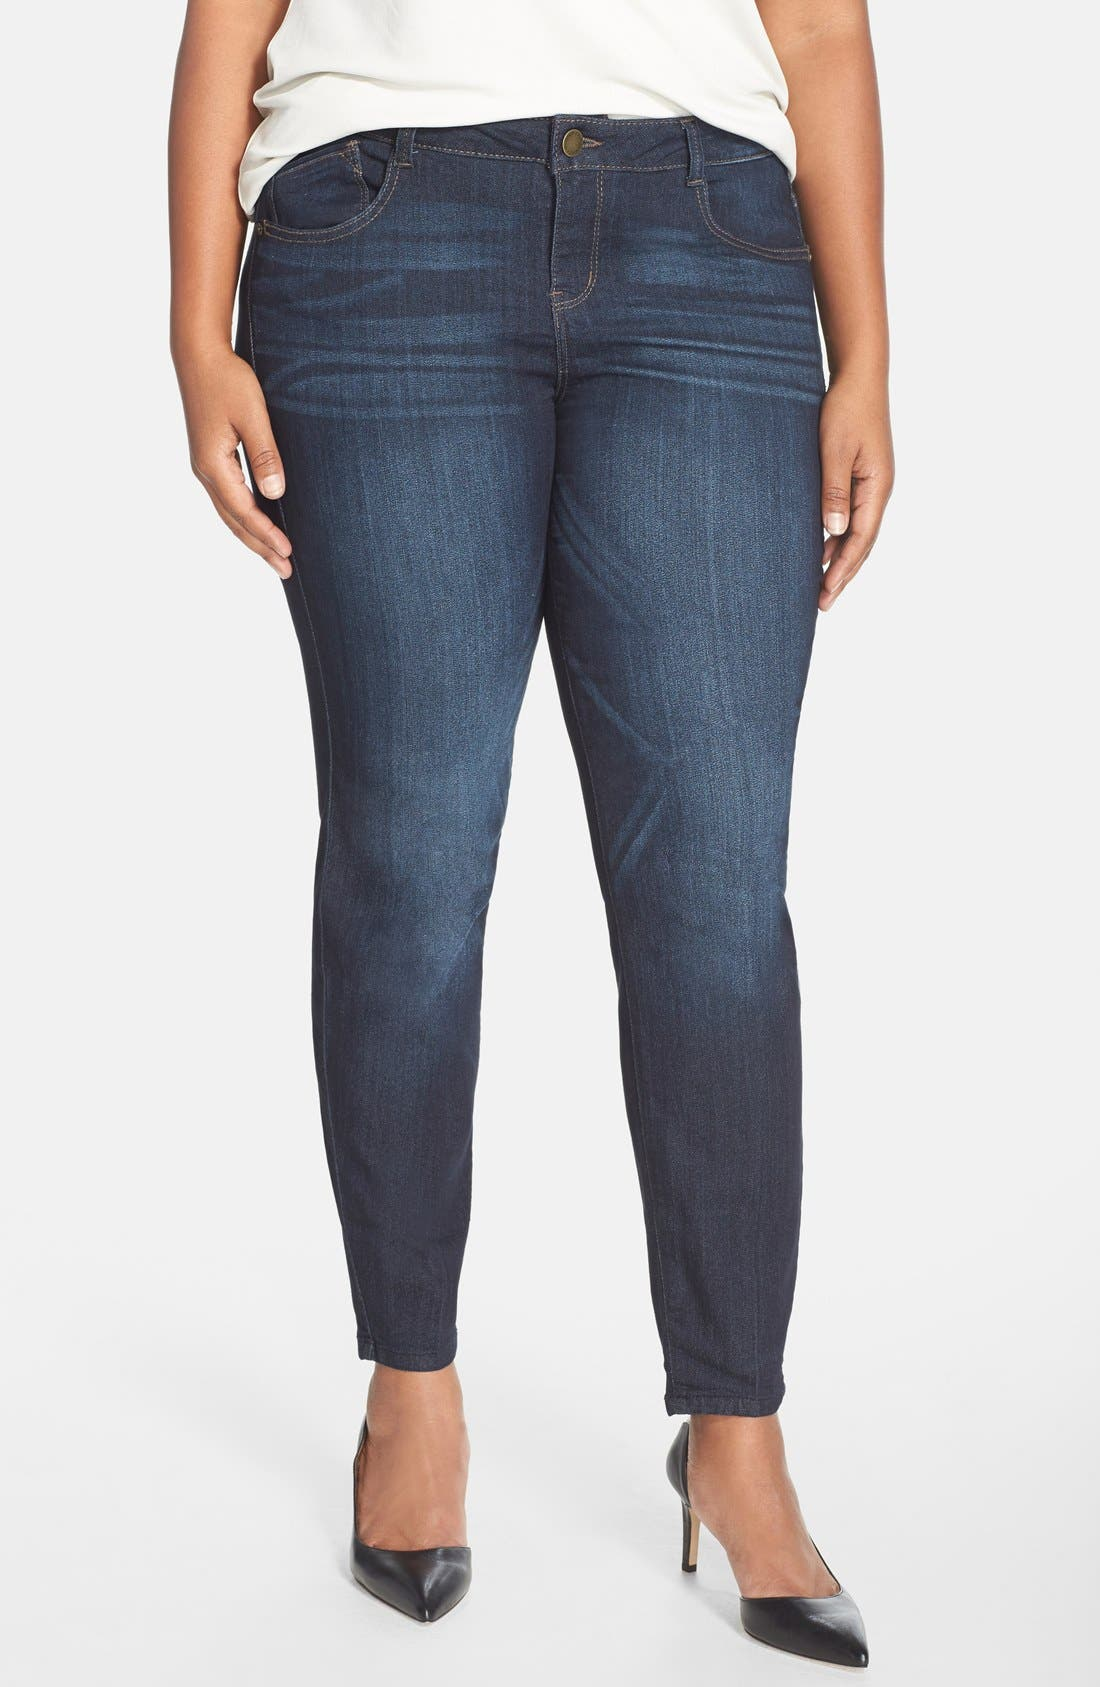 Wit & Wisdom 'Super Smooth' Stretch Skinny Jeans (Dark Navy) (Plus Size) (Nordstrom Exclusive)